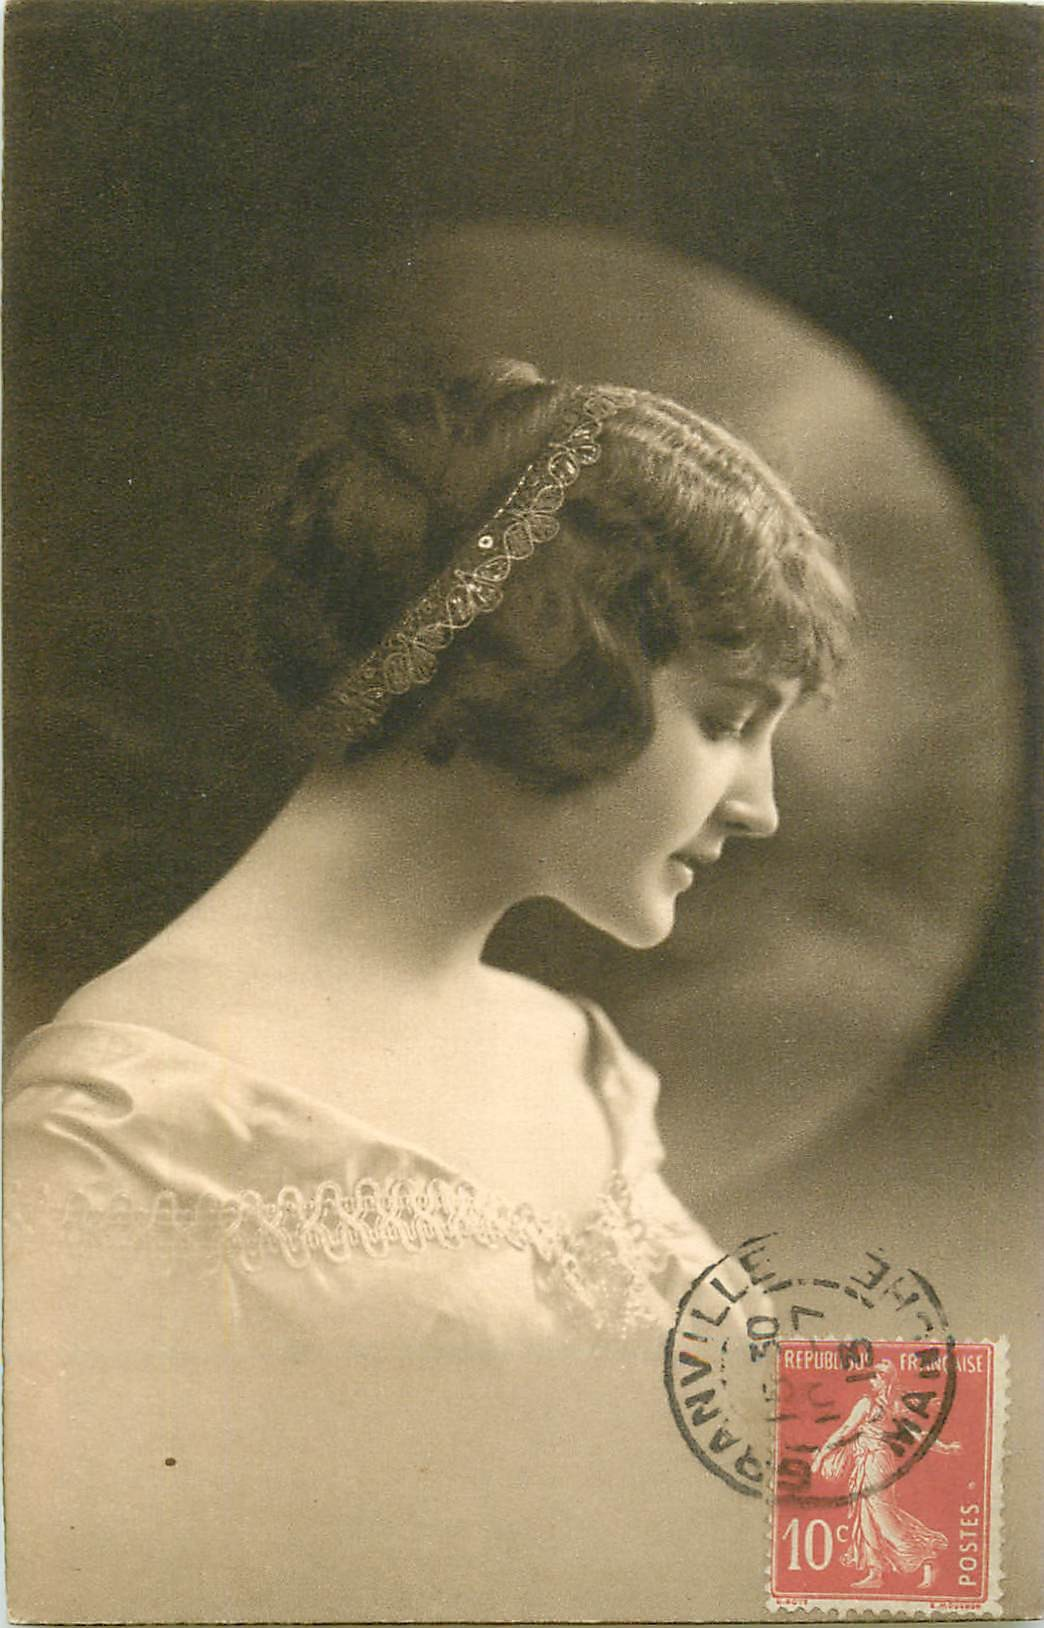 FANTAISIE. Femme avec dentelle dans chevelure 1913